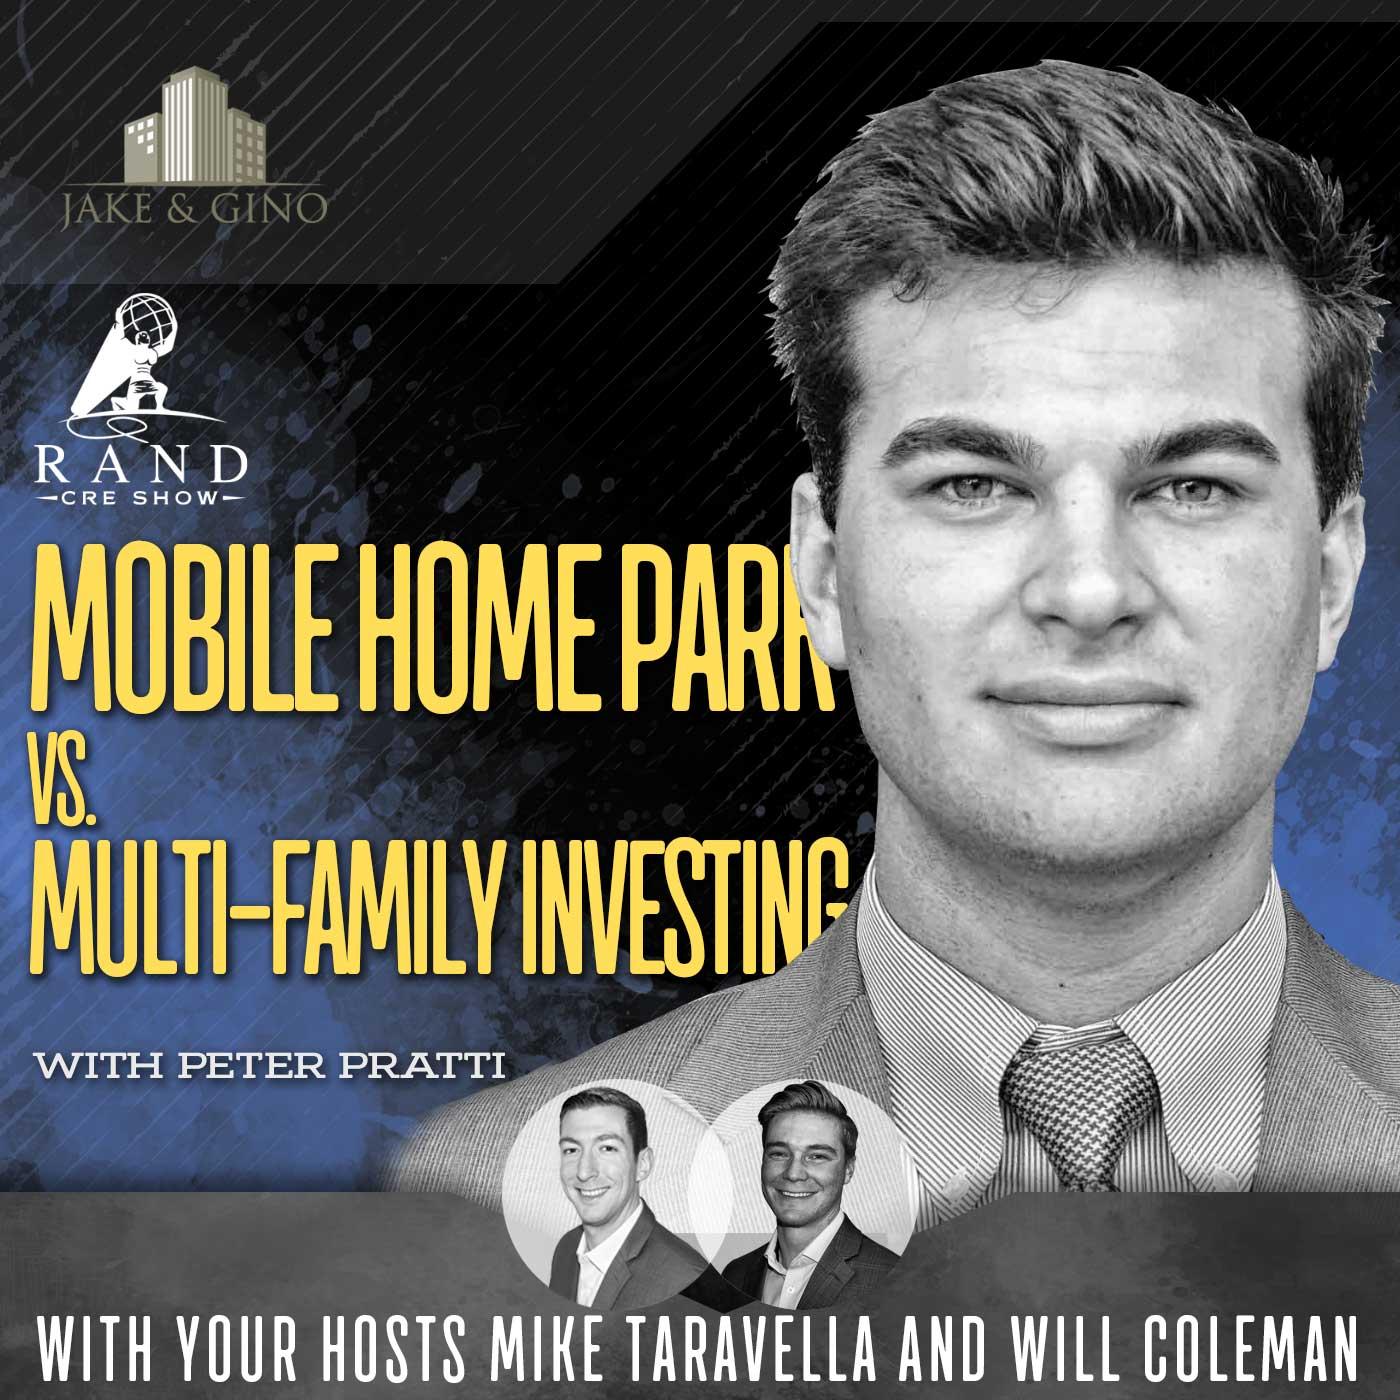 RCRE - Mobile Home Park vs. Multi-family Investing with Peter Pratti